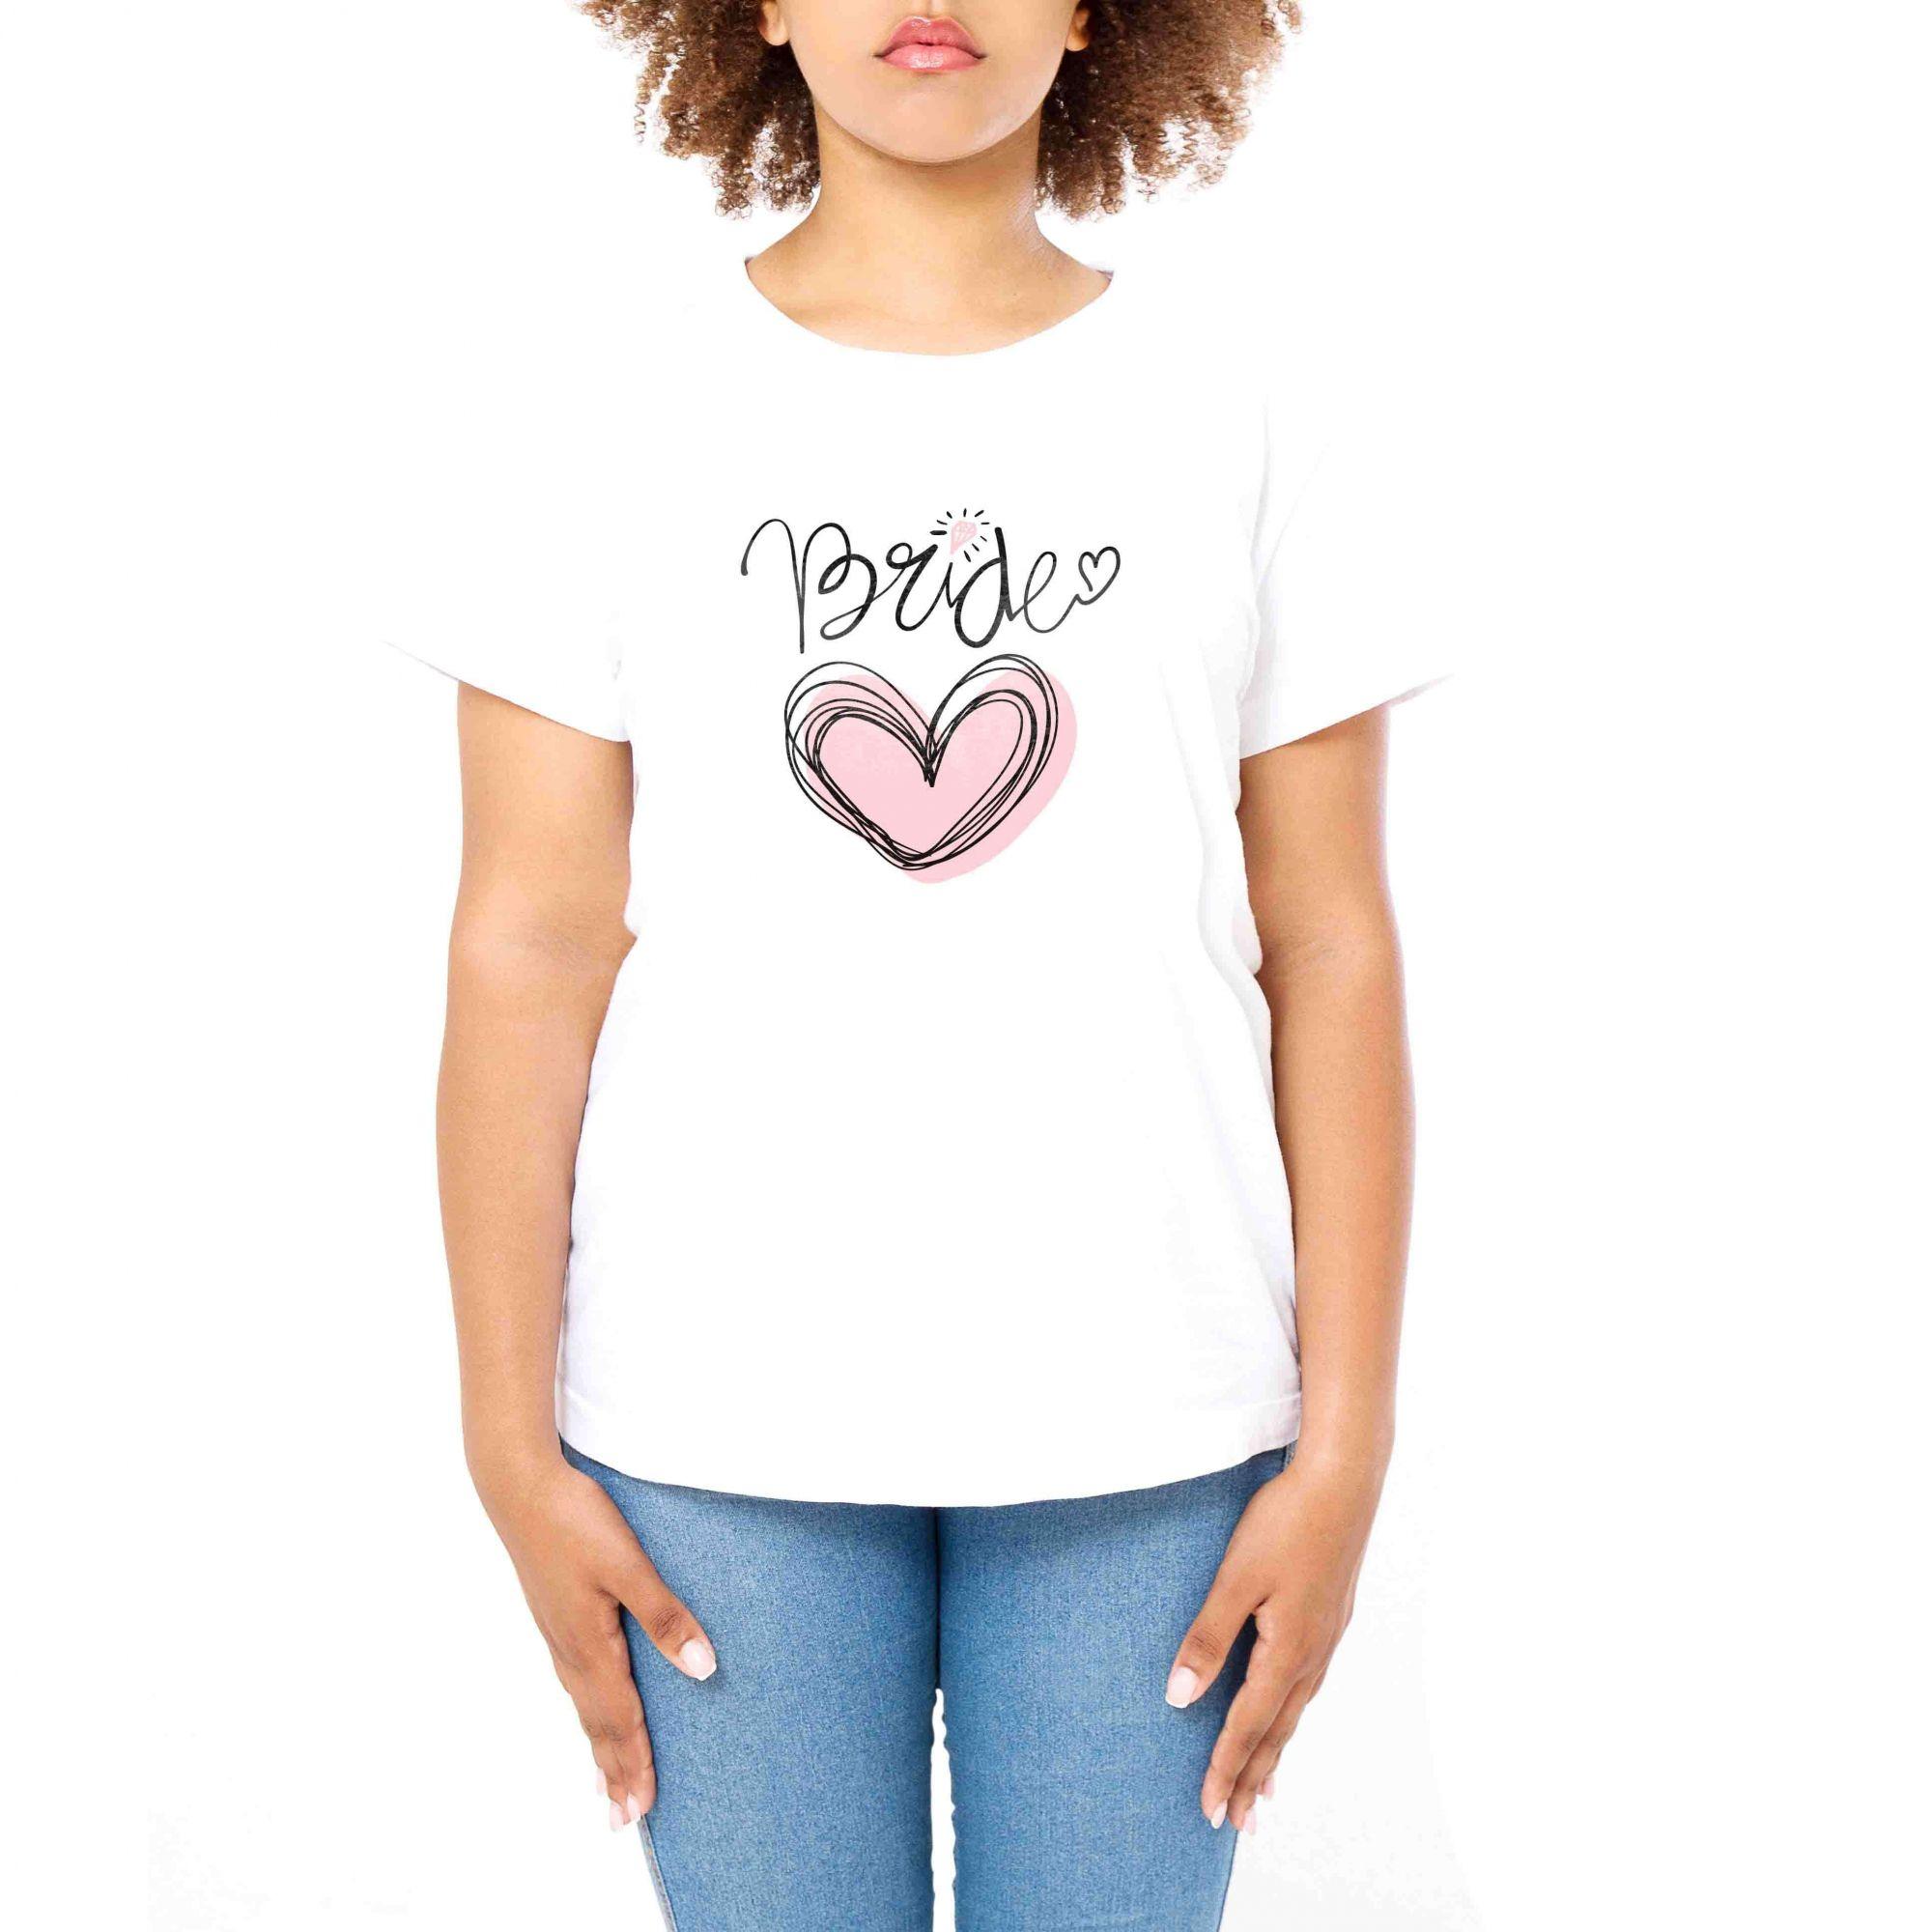 Camiseta Feminina Personalizada para Despedida de Solteira